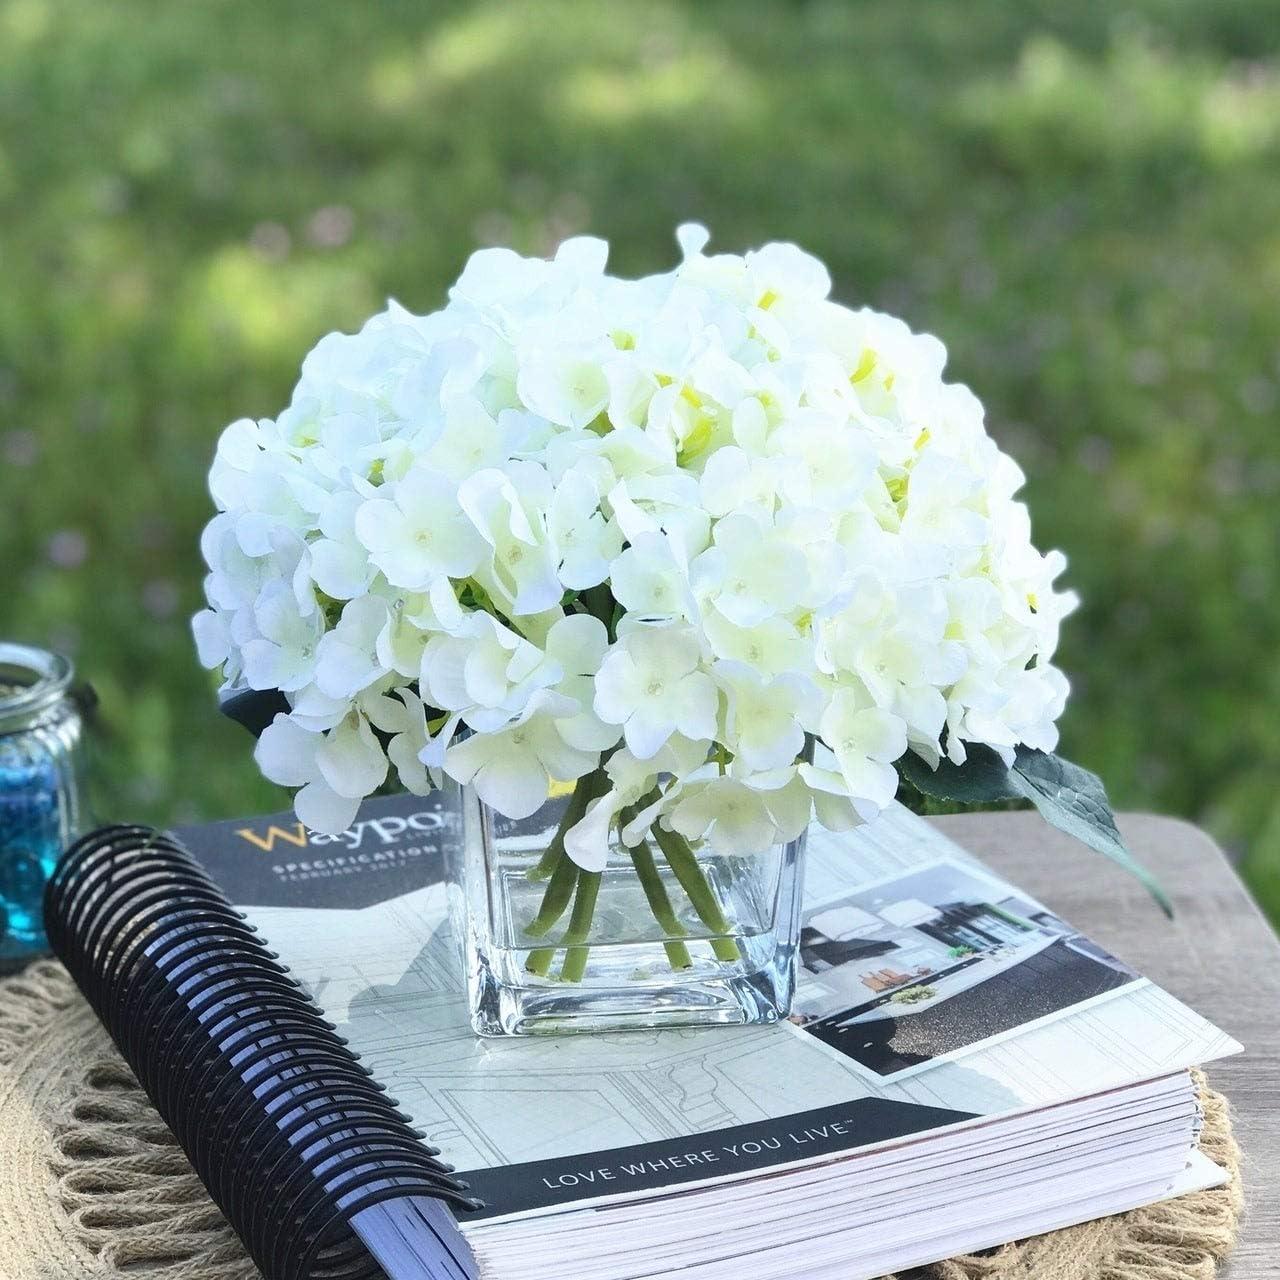 Home Decor Artificial Silk Flower Arrangement Black Cream In Black Vase Lights Up Home Furniture Diy New Times Bg